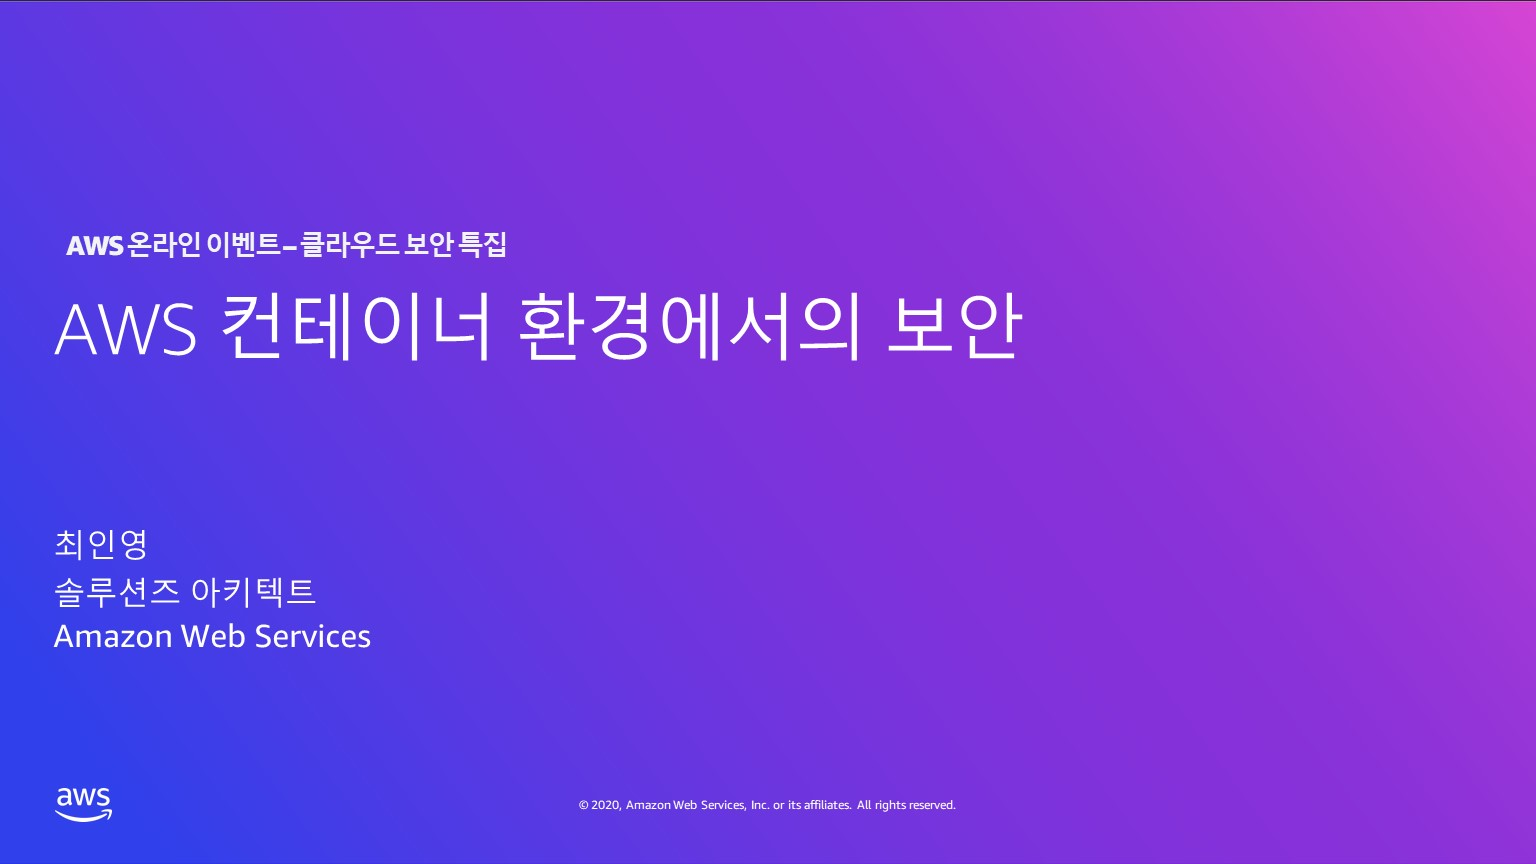 AWS_컨테이너_환경의_보안_최인영